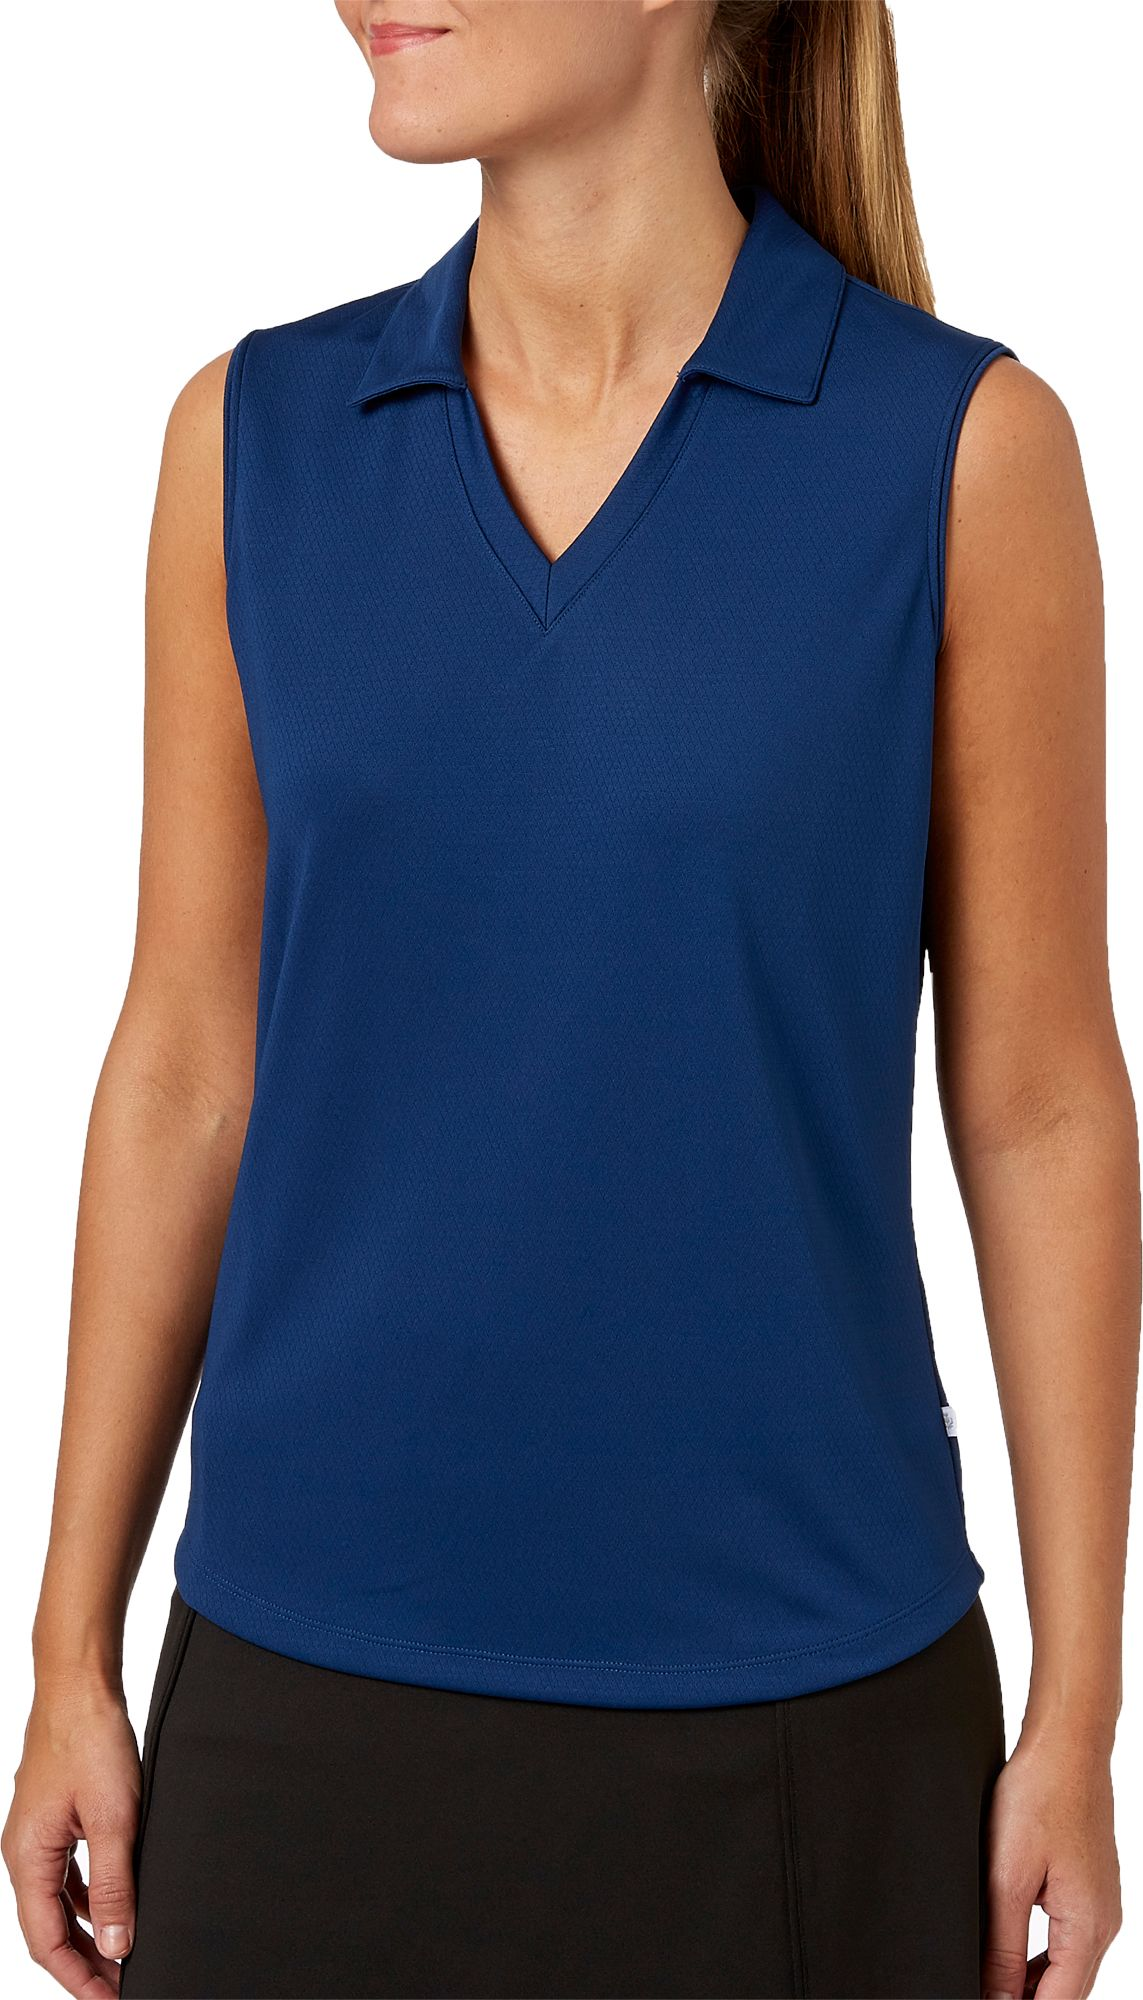 c170e2e6658 Lady Hagen Women s Essentials Sleeveless Golf Polo – Plus Size ...